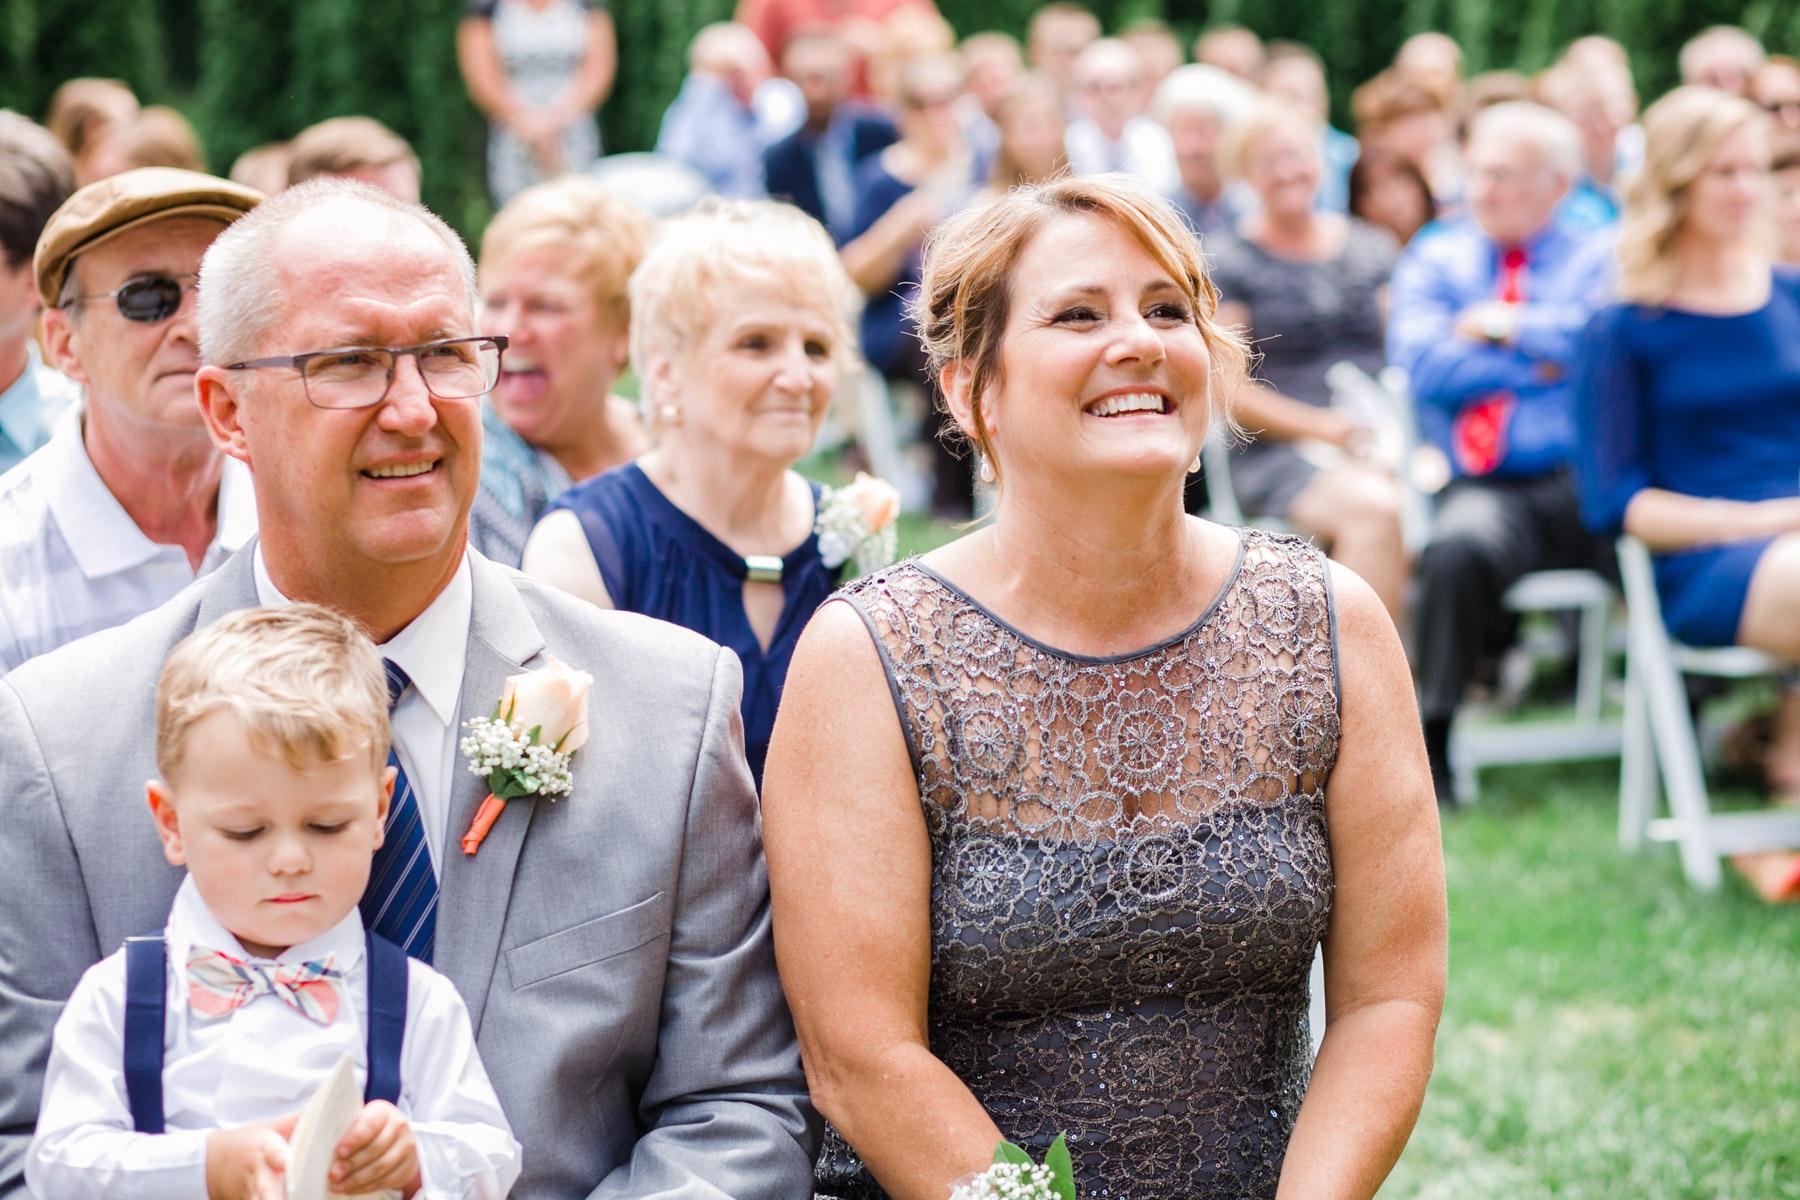 wildwood-park-wedding-photos-35.jpg